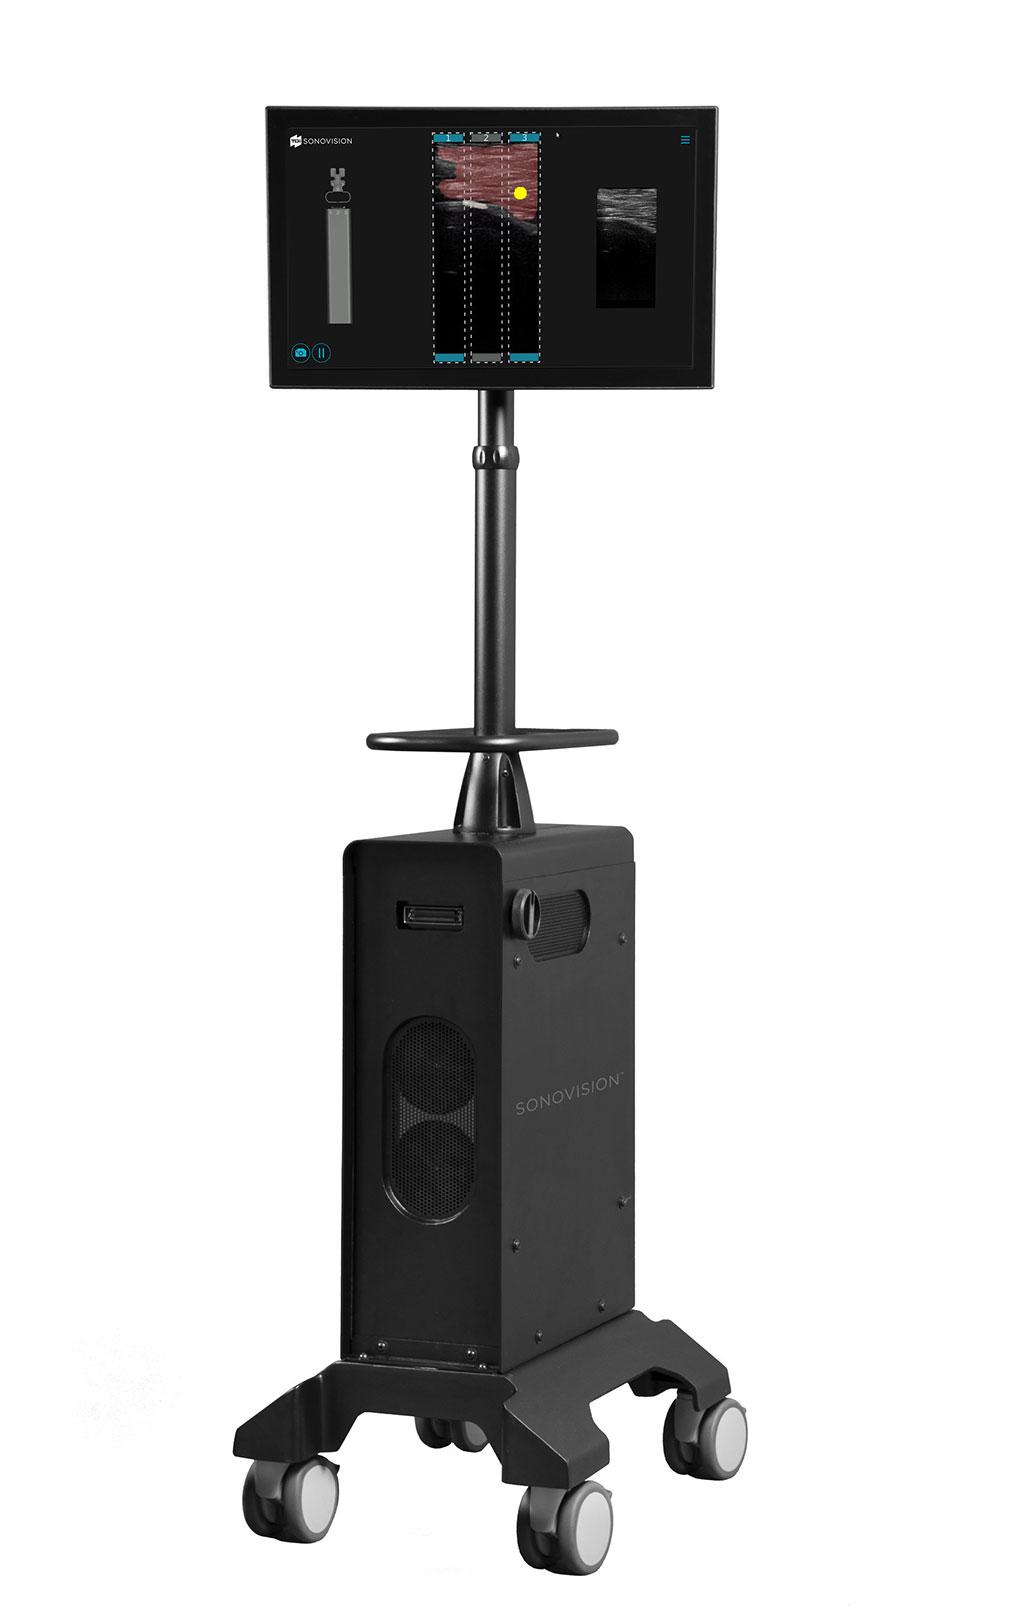 Image: The SonoVision ultrasound imaging system (Photo courtesy of TDi).